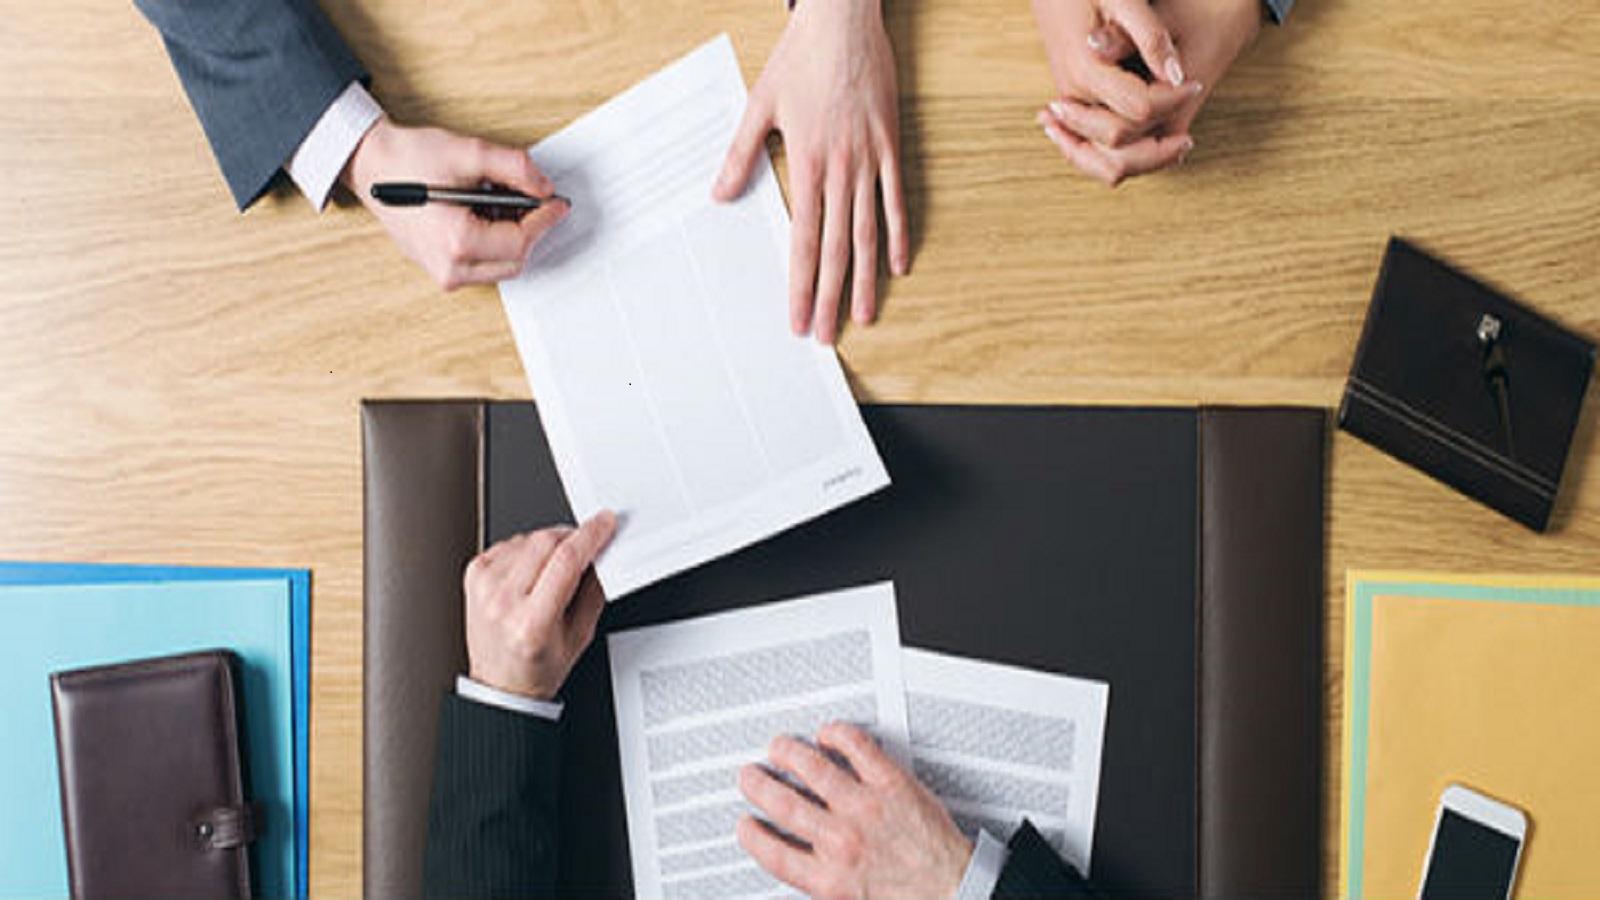 Memilih dan Menggunakan Jasa Pengacara/Advokat Ada Tips-nya ?